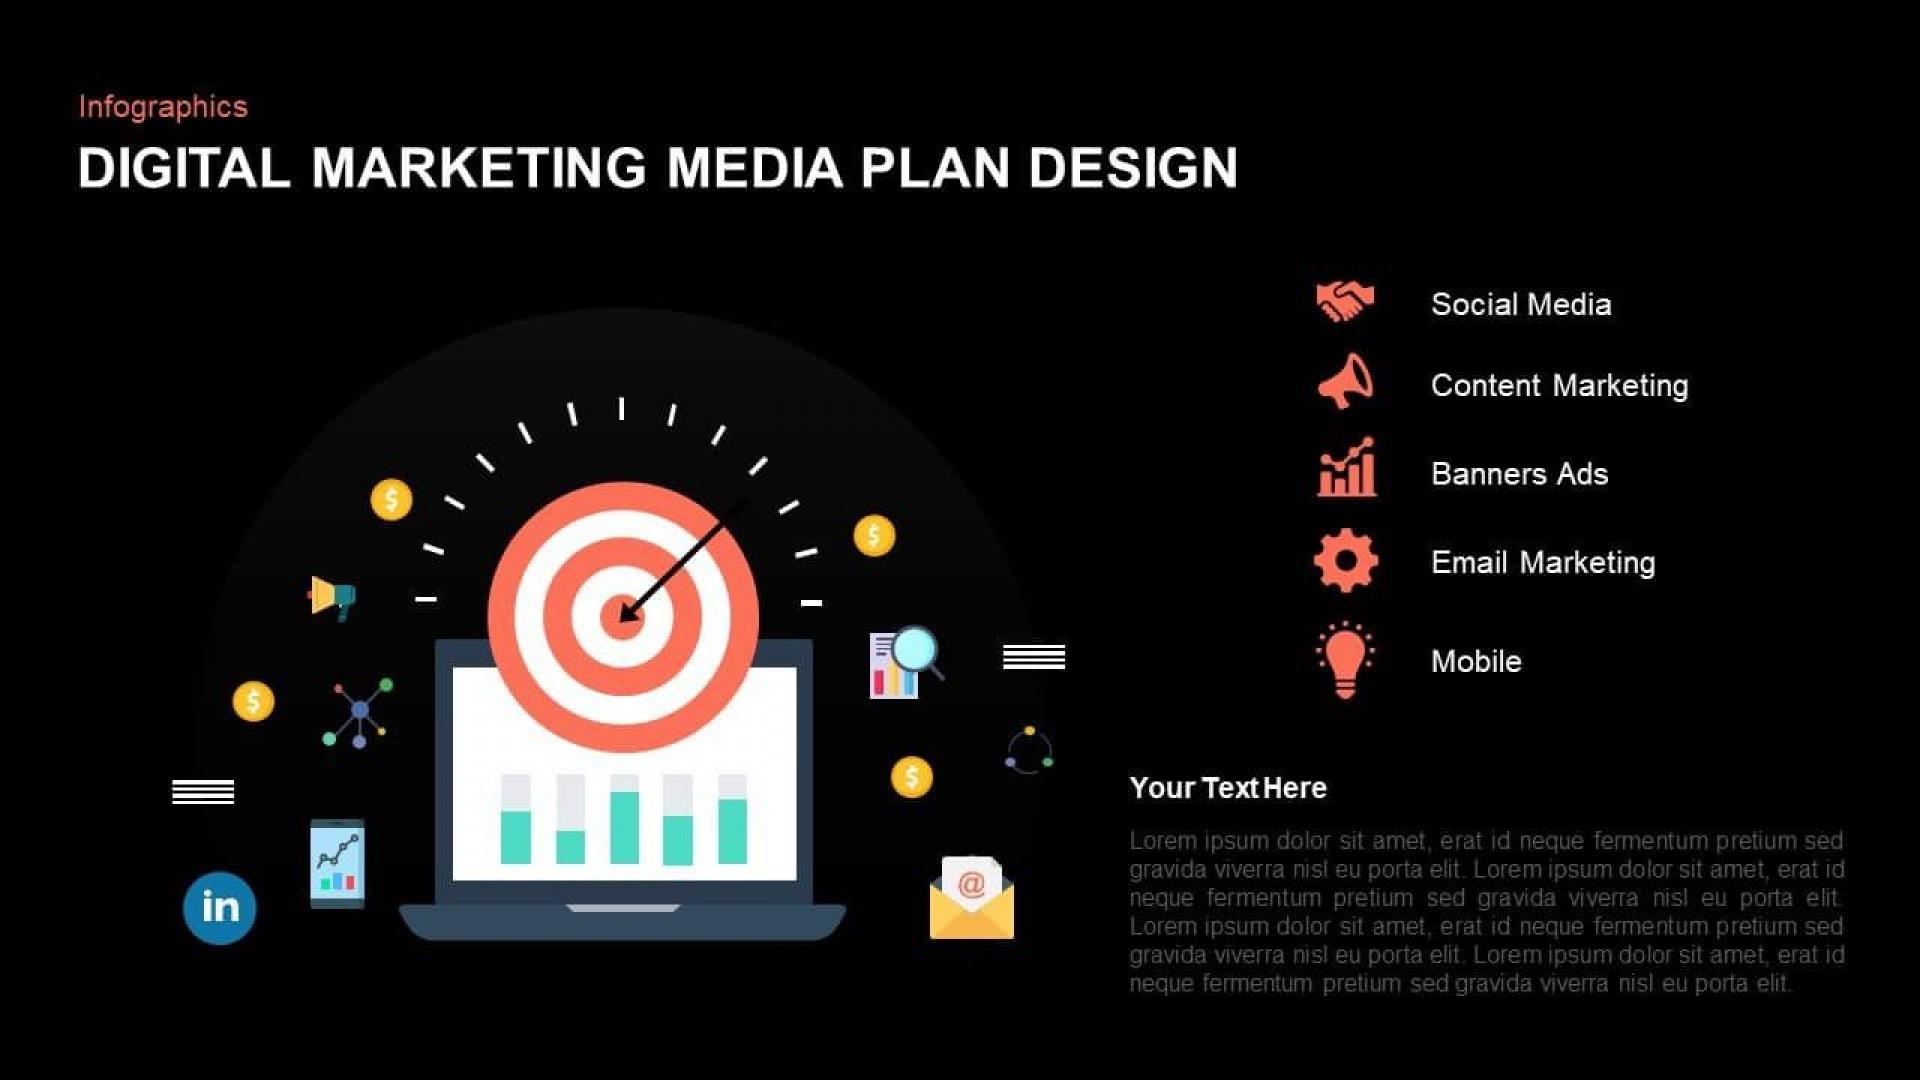 003 Impressive Digital Marketing Plan Ppt Presentation Image 1920